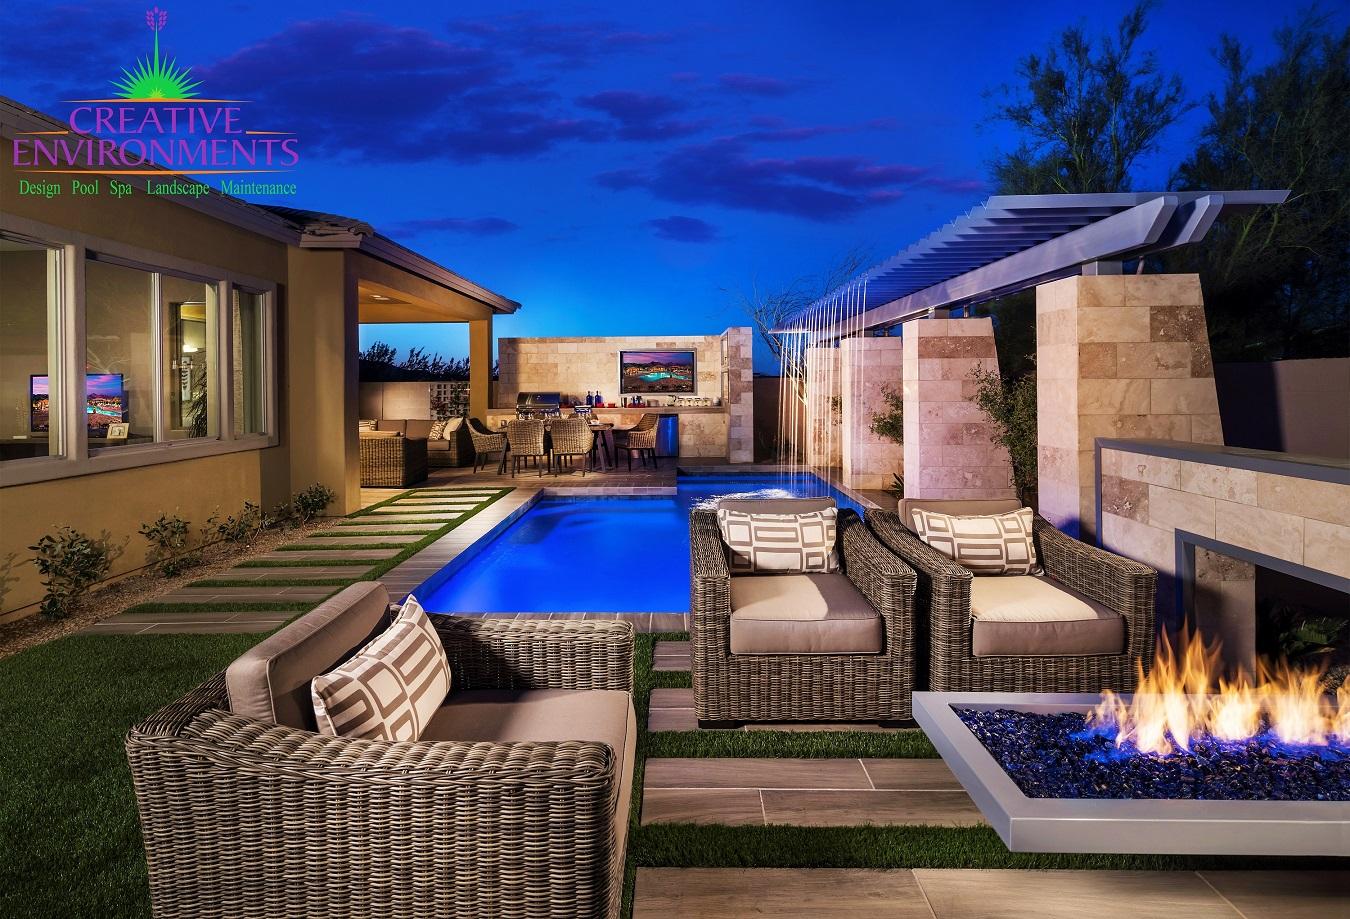 Windgate Model Pool